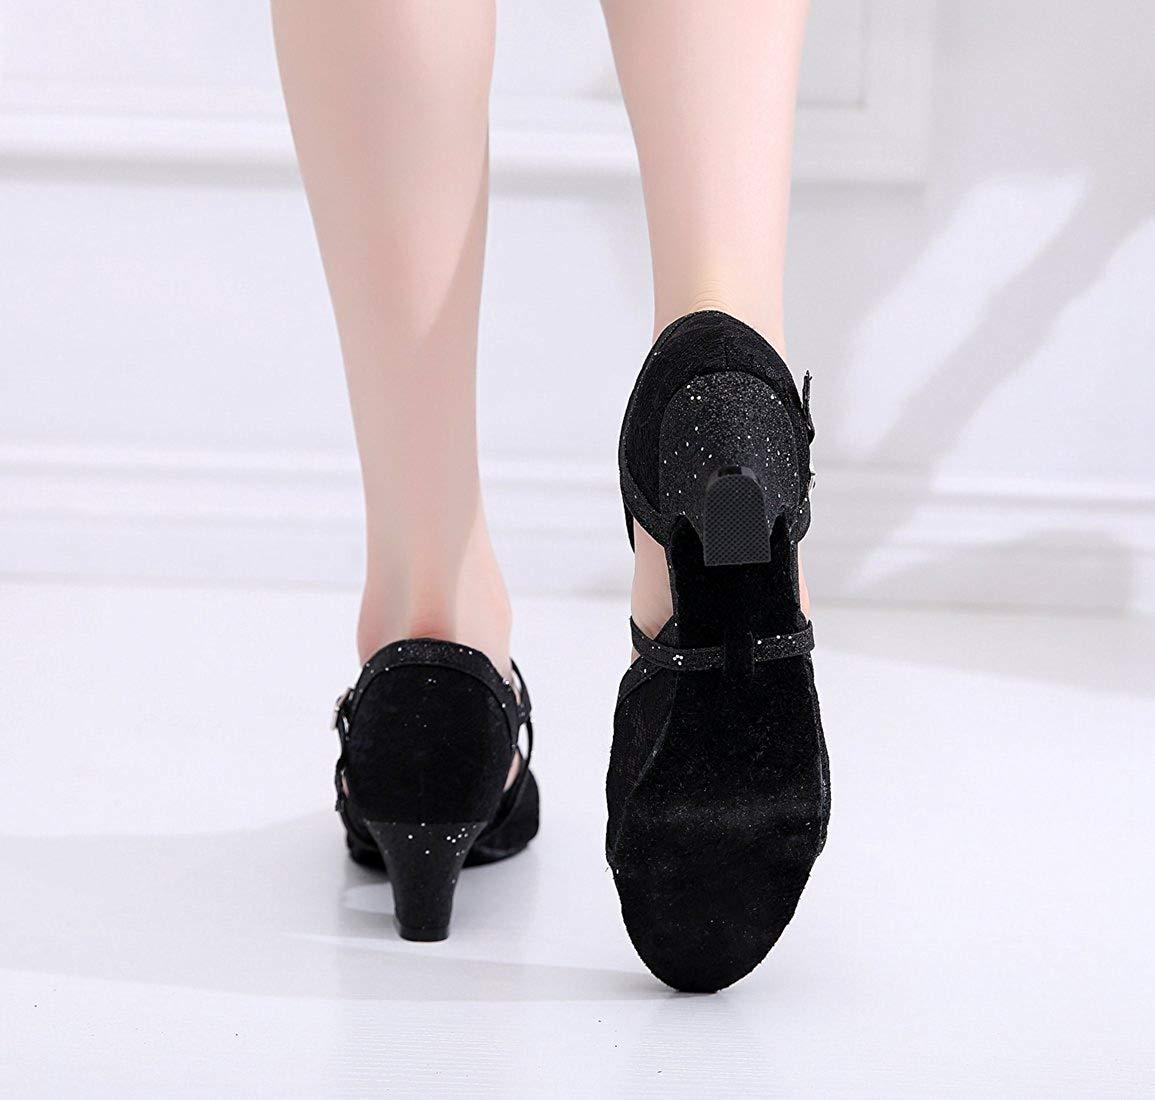 Qiusa Damen Cross Strap Strap Strap Schwarz Spitze Salsa Latin Dancing Schuhe Formale Partei Pumps UK 8 (Farbe   - Größe   -) 8d9304